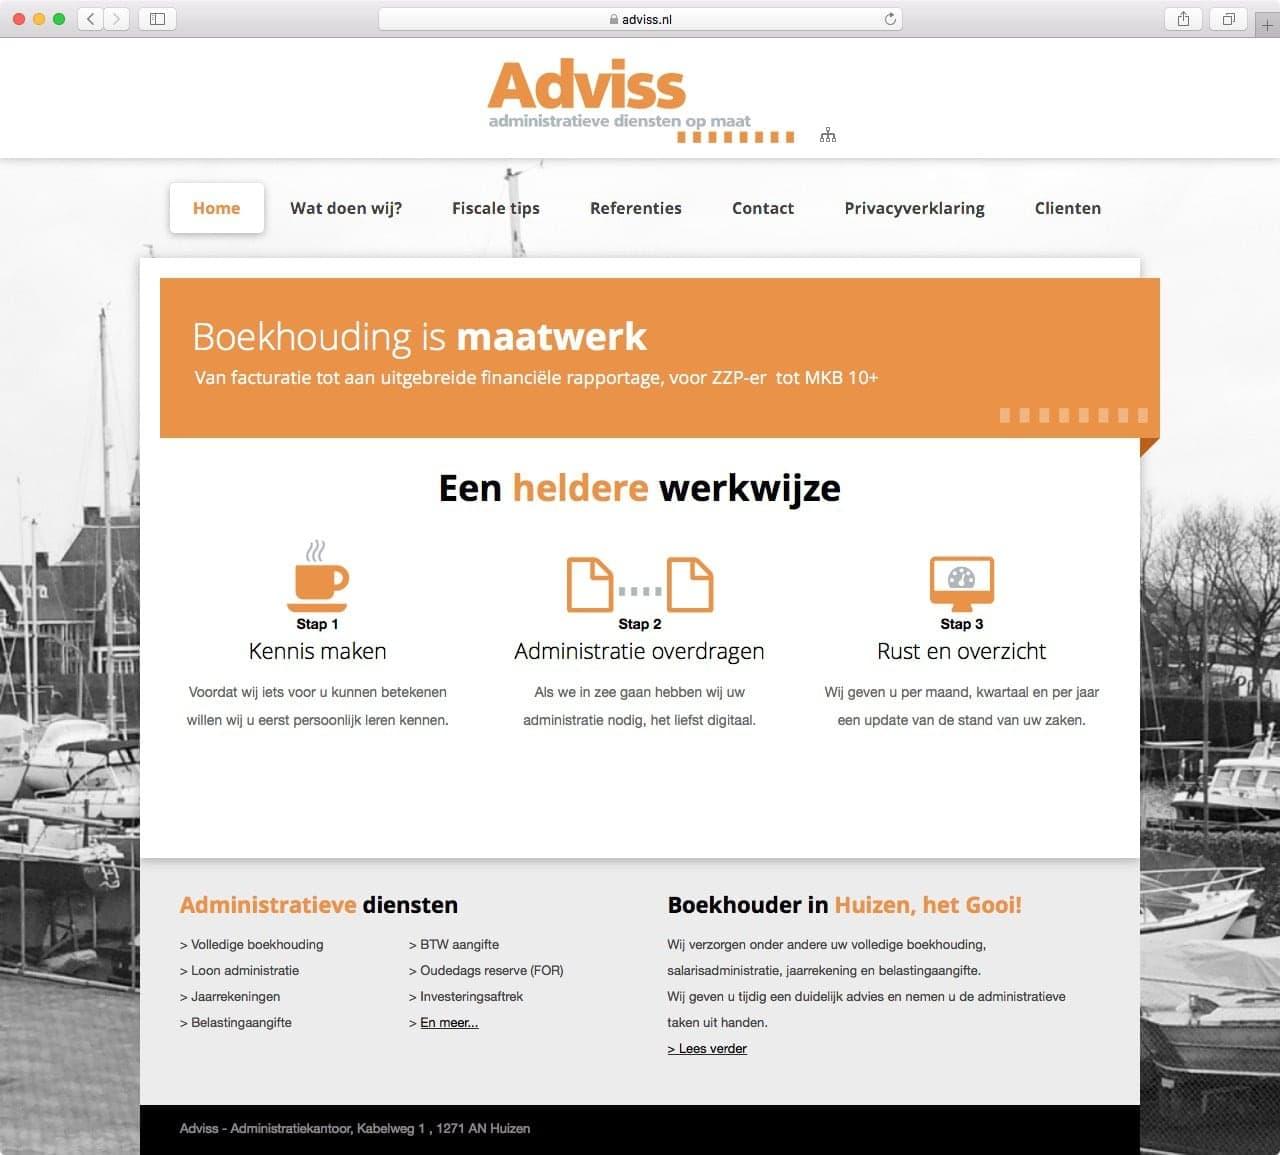 Adviss